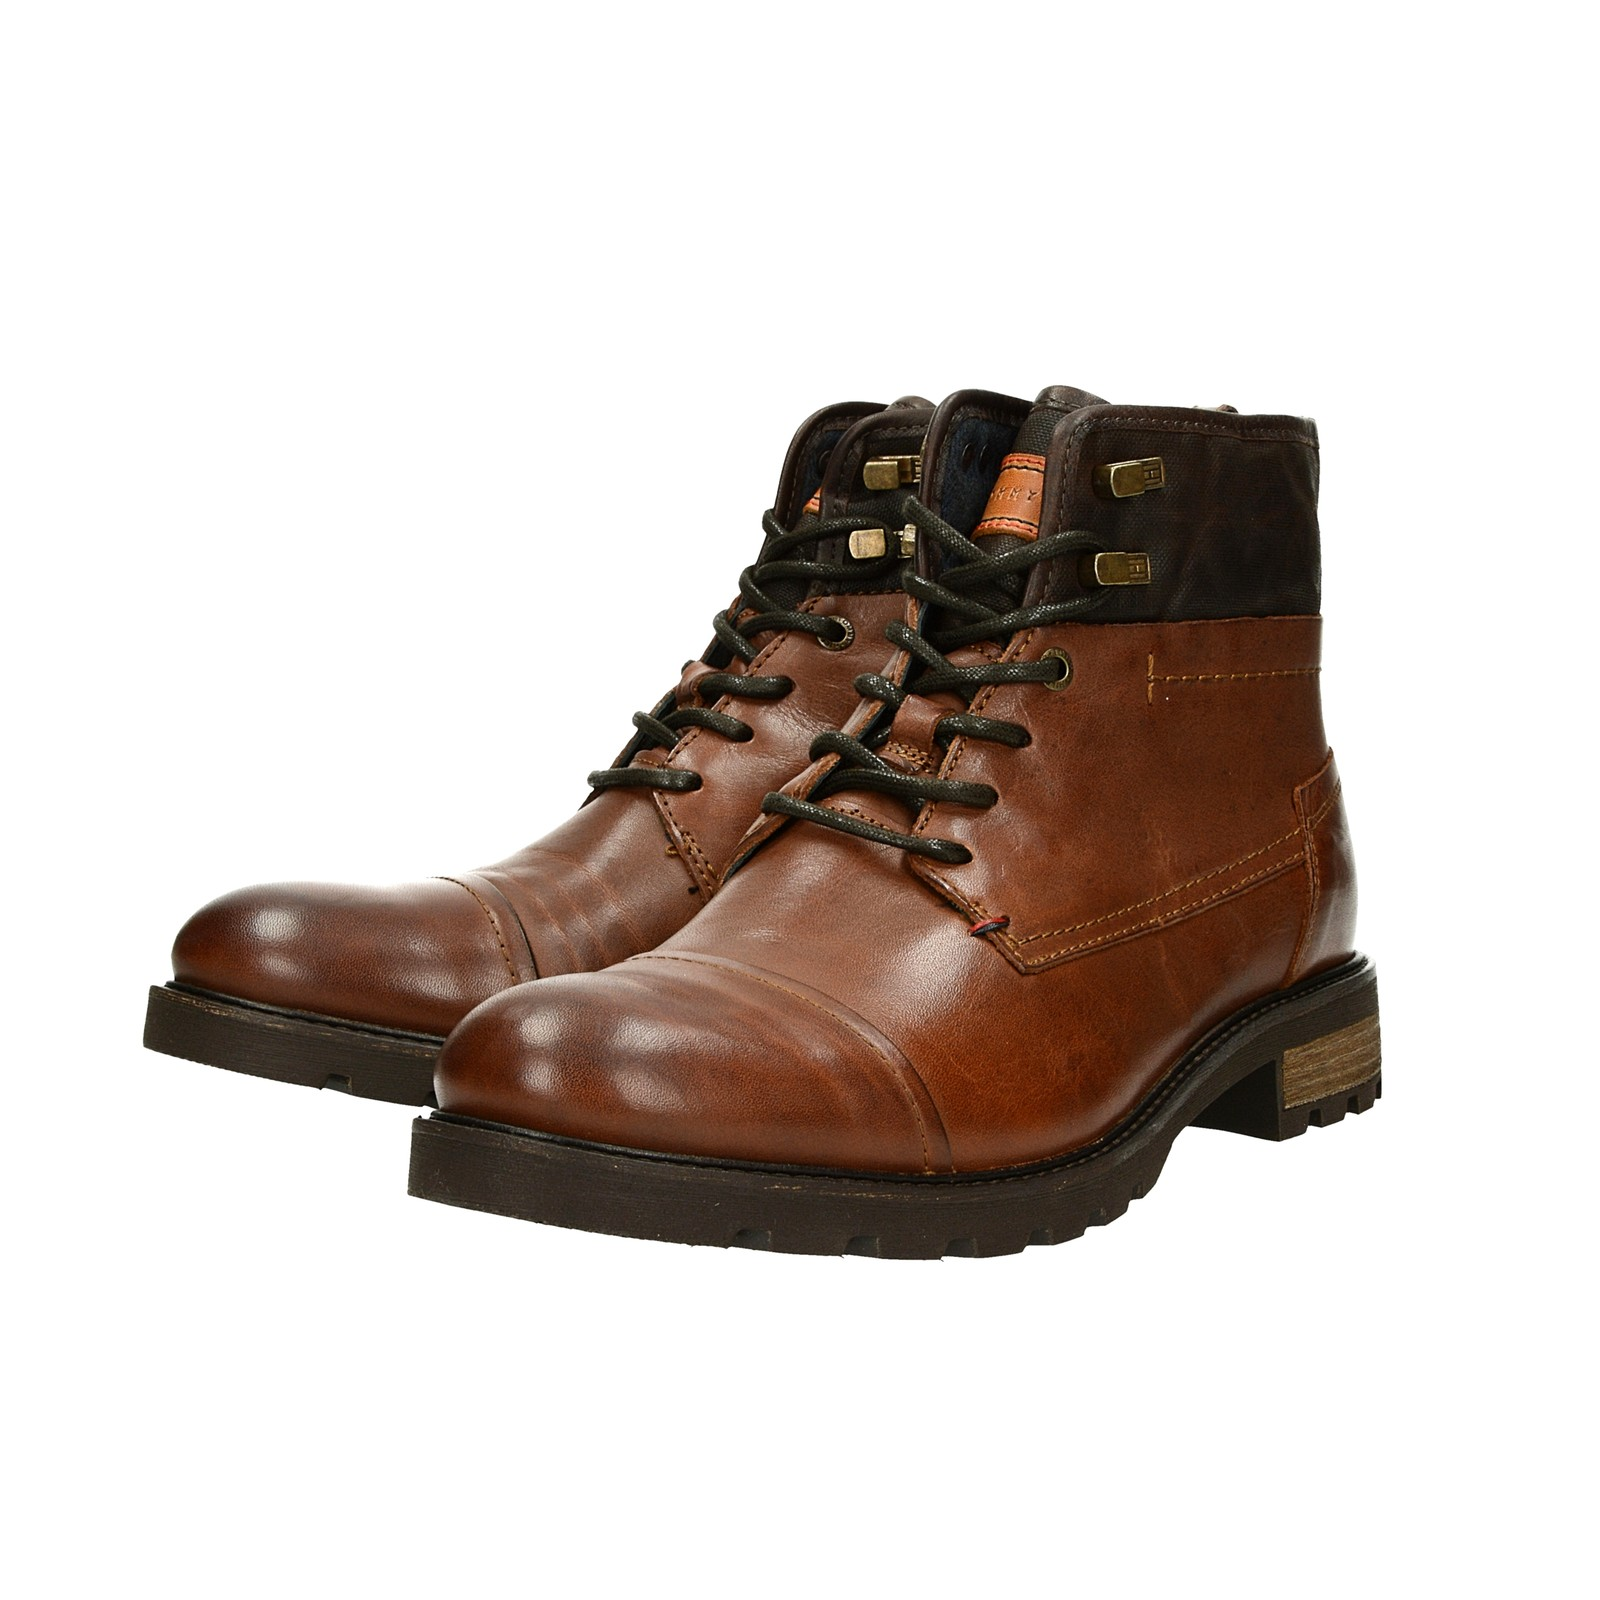 ce7b555f63 ... Tommy Hilfiger pánska štýlová členková obuv - koňaková ...